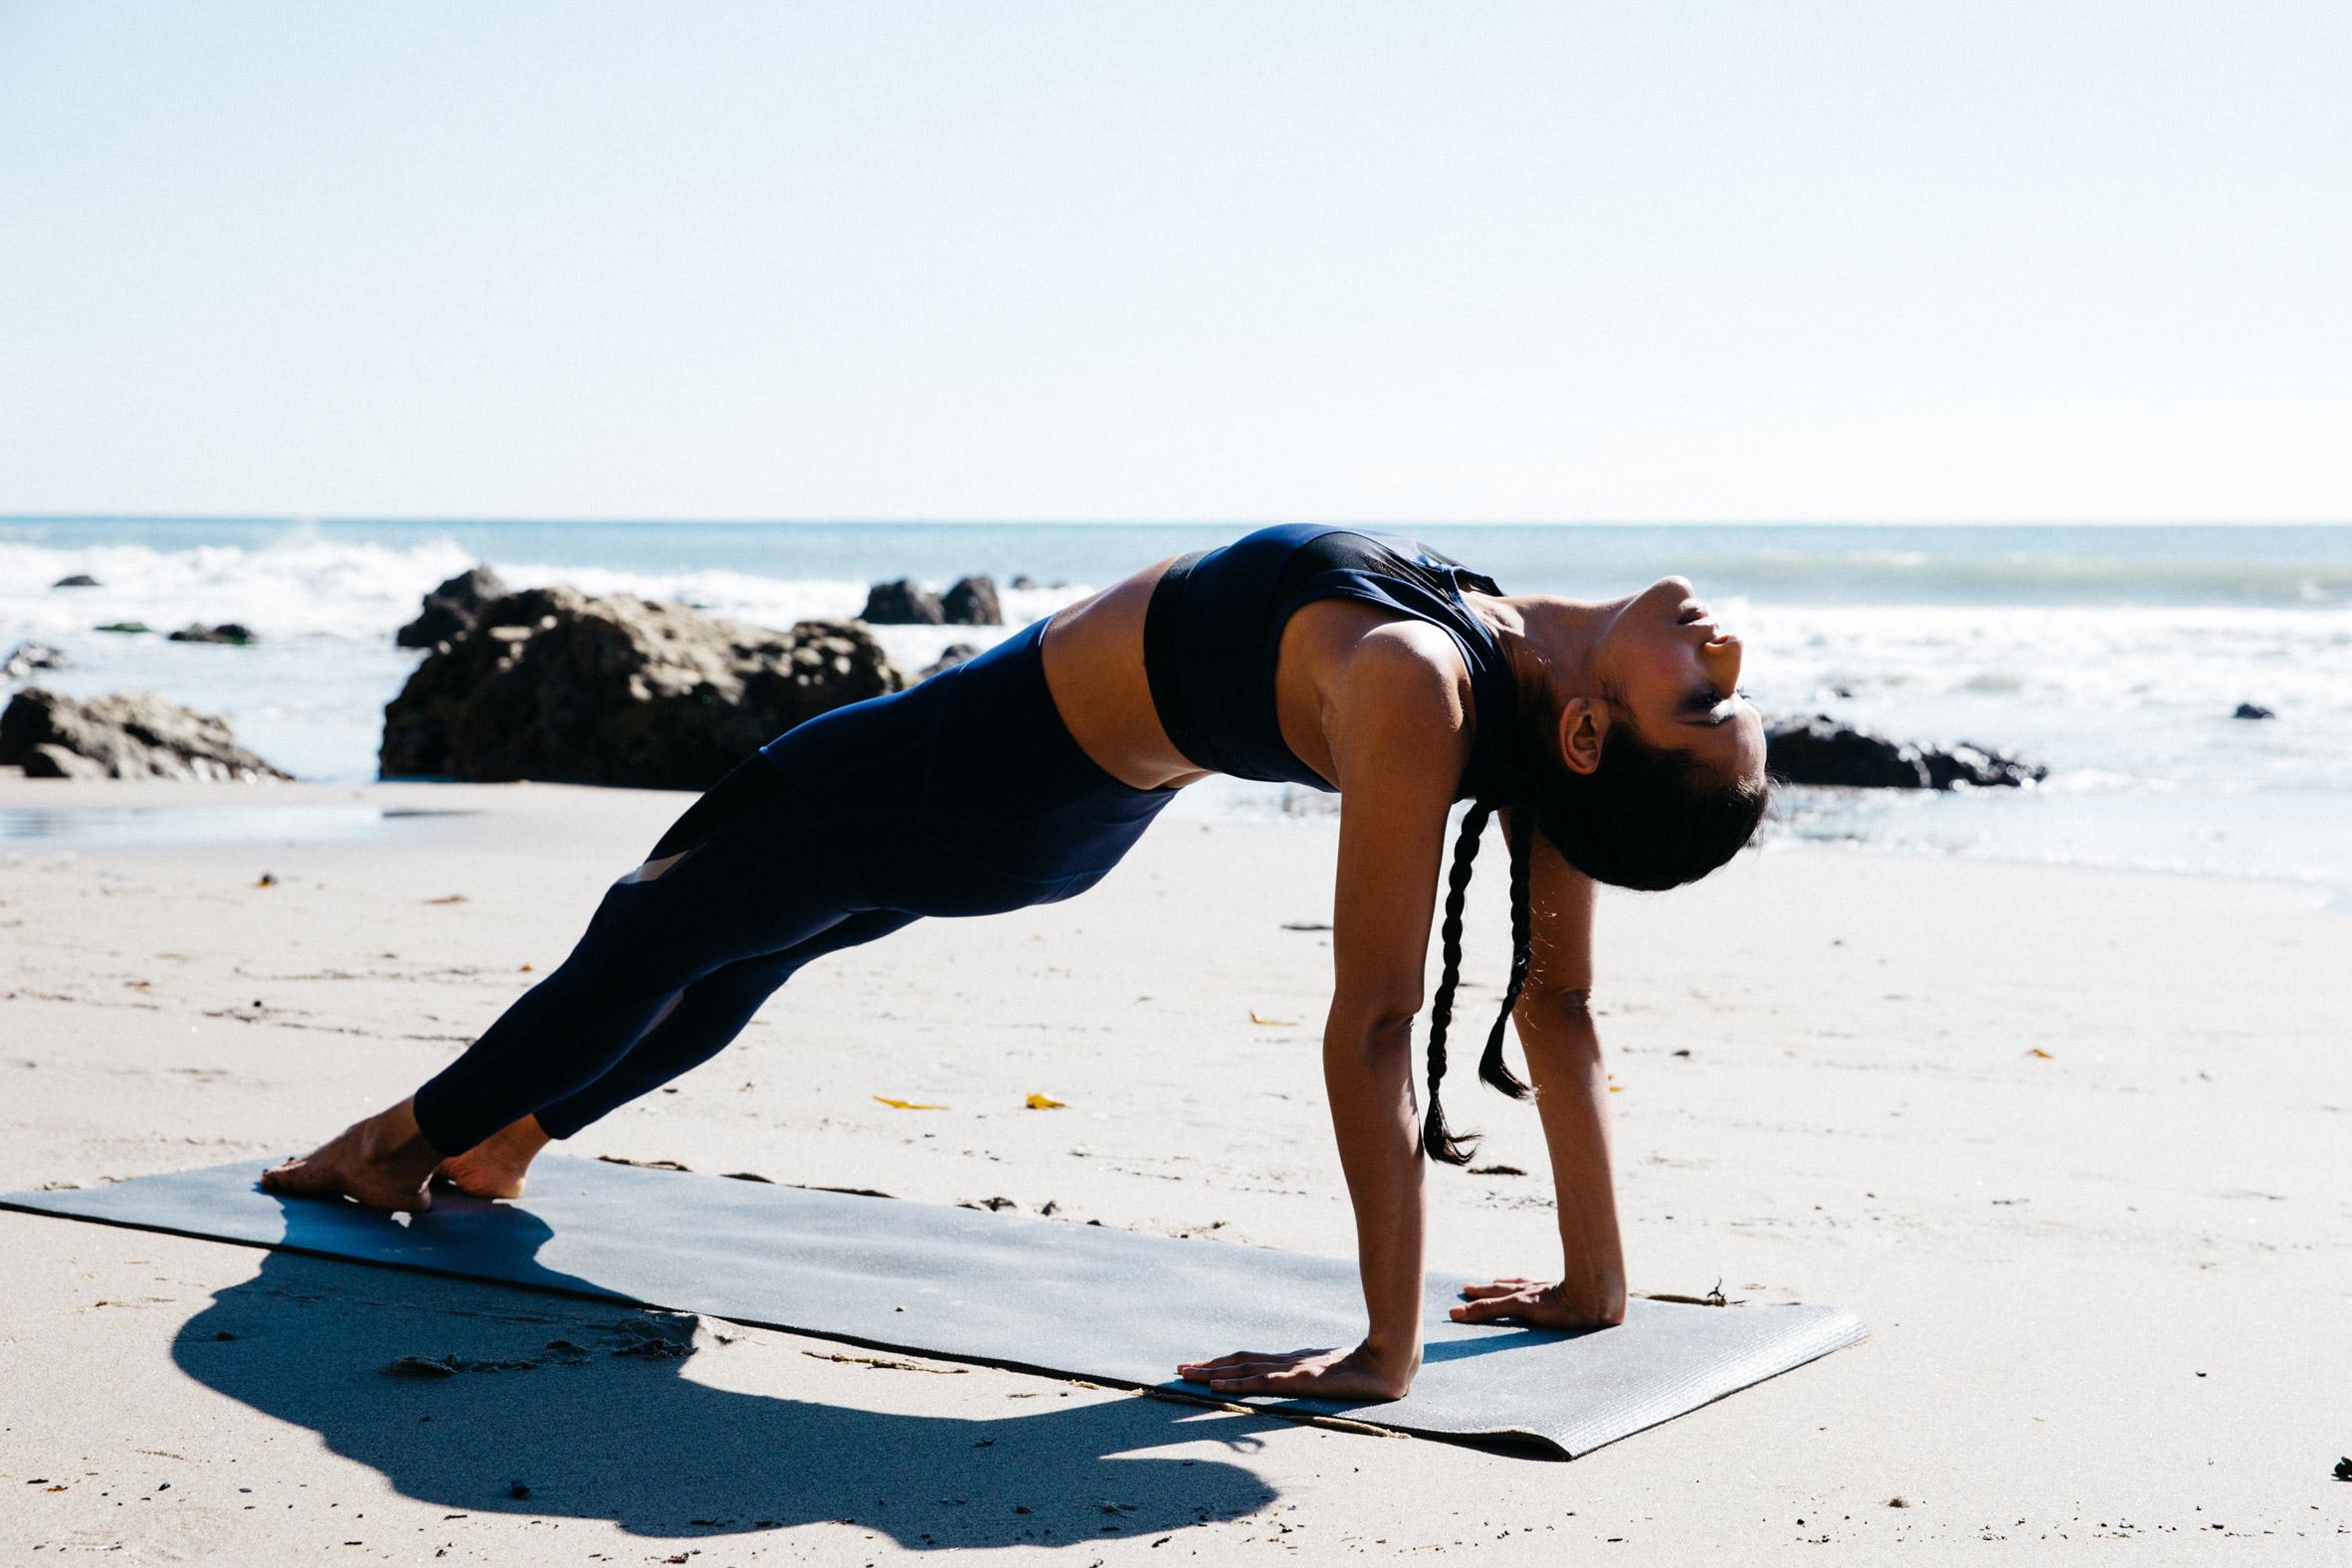 Smart yoga pants by Wearable X